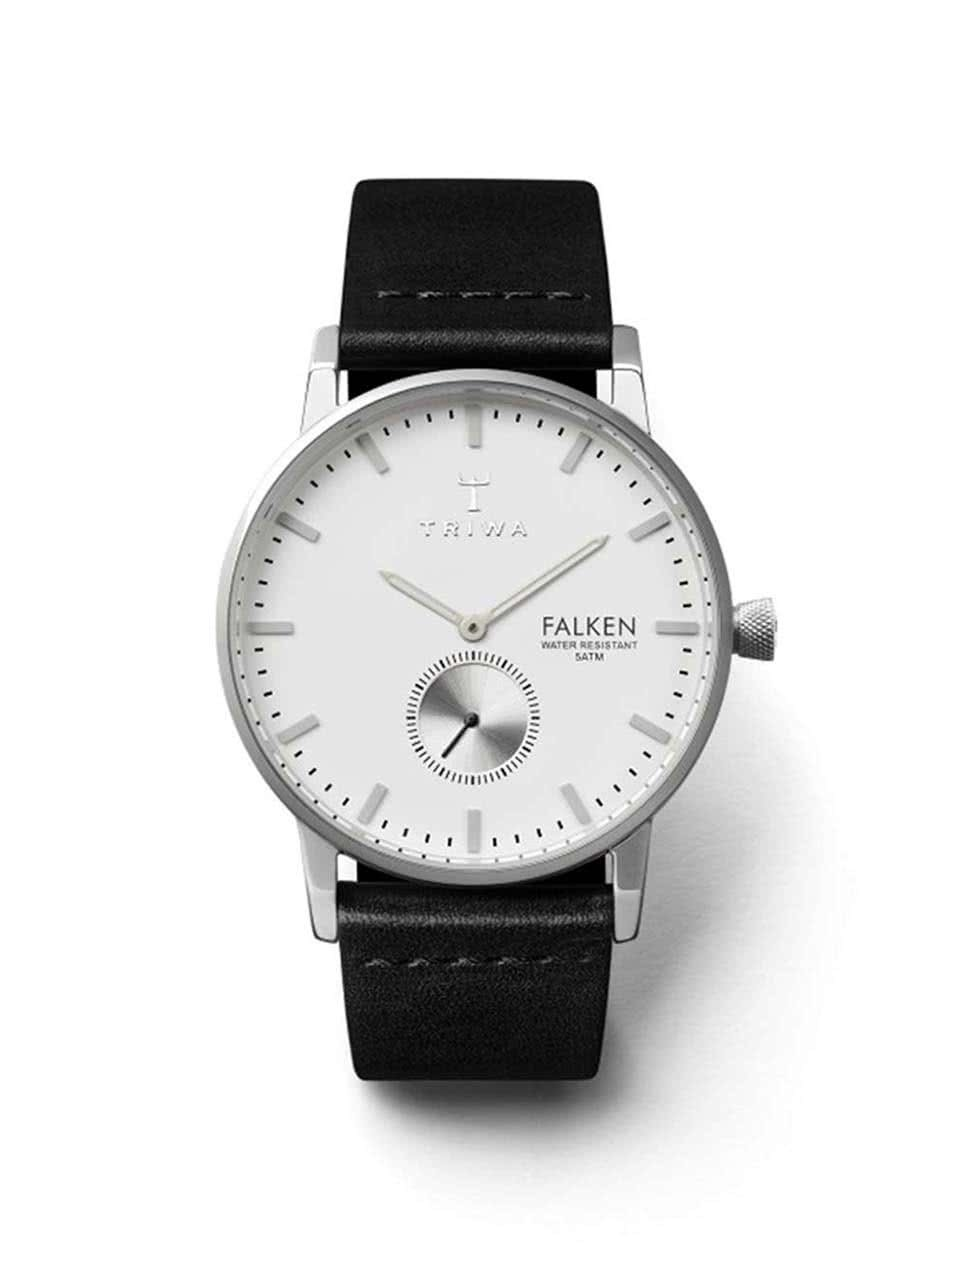 Bílo-černé unisex kožené hodinky TRIWA Ivory Falken